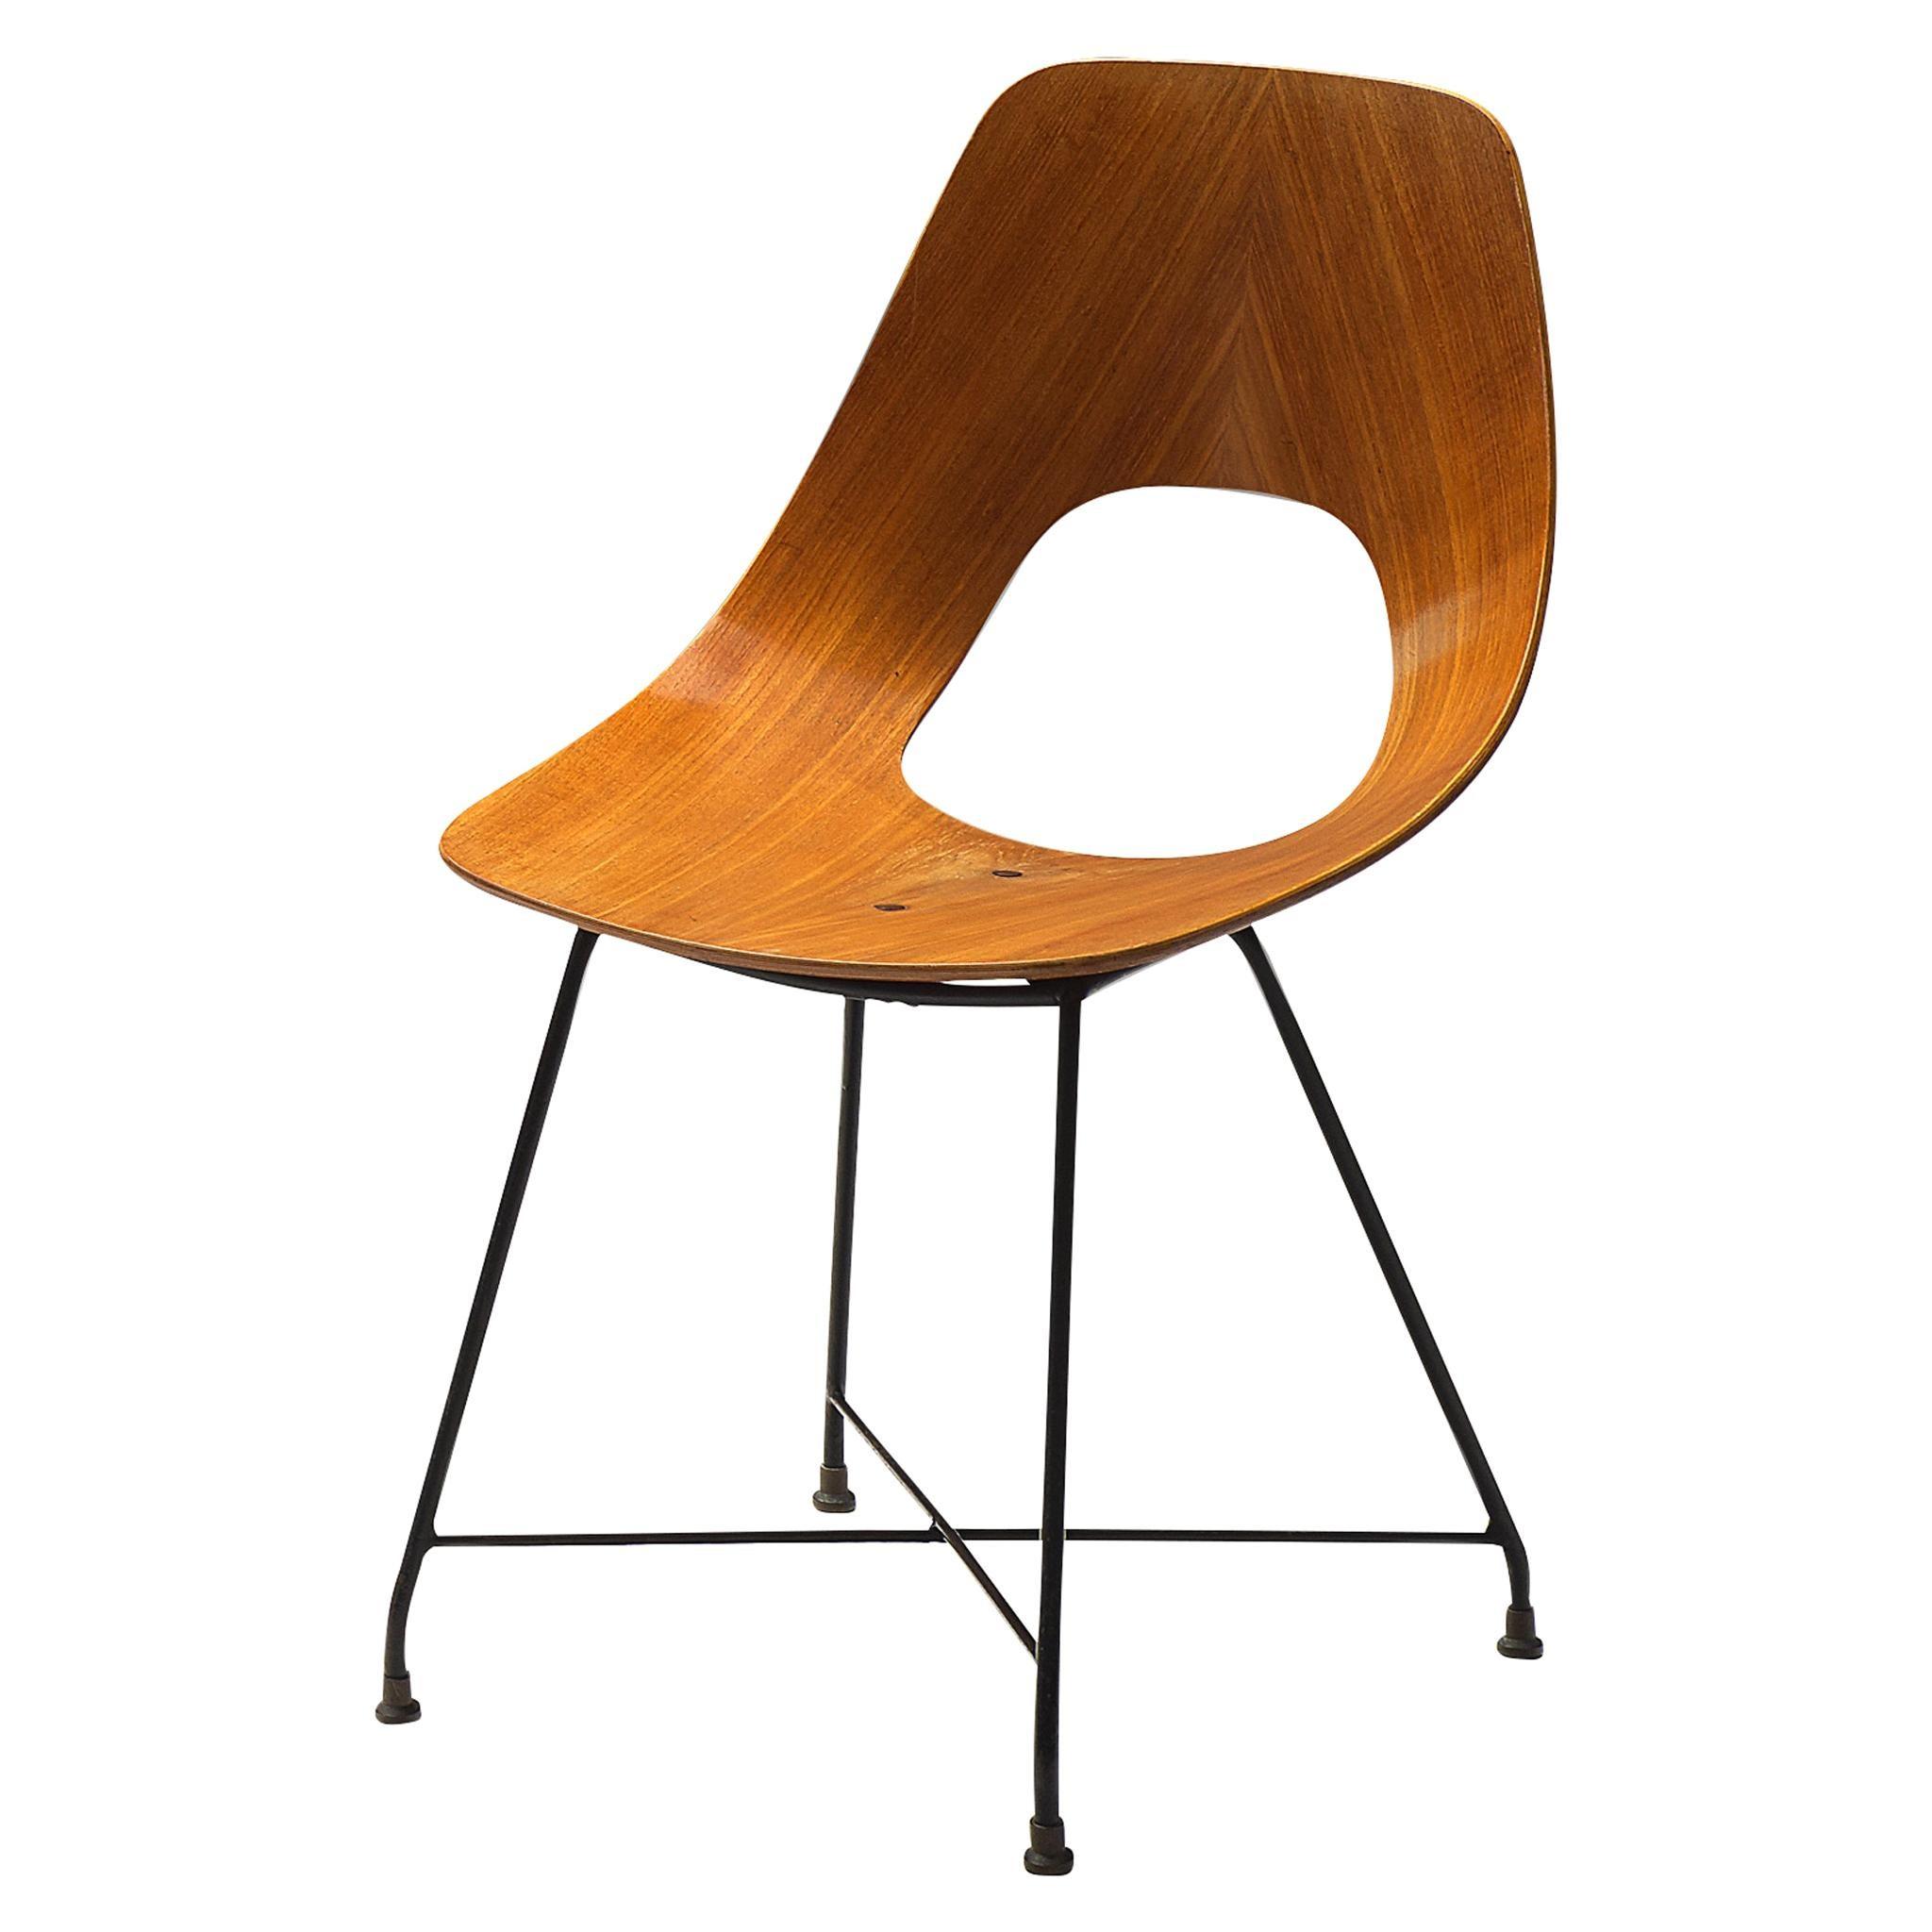 Augusto Bozzi Saporiti 'Ariston' Dining Chair in Teak